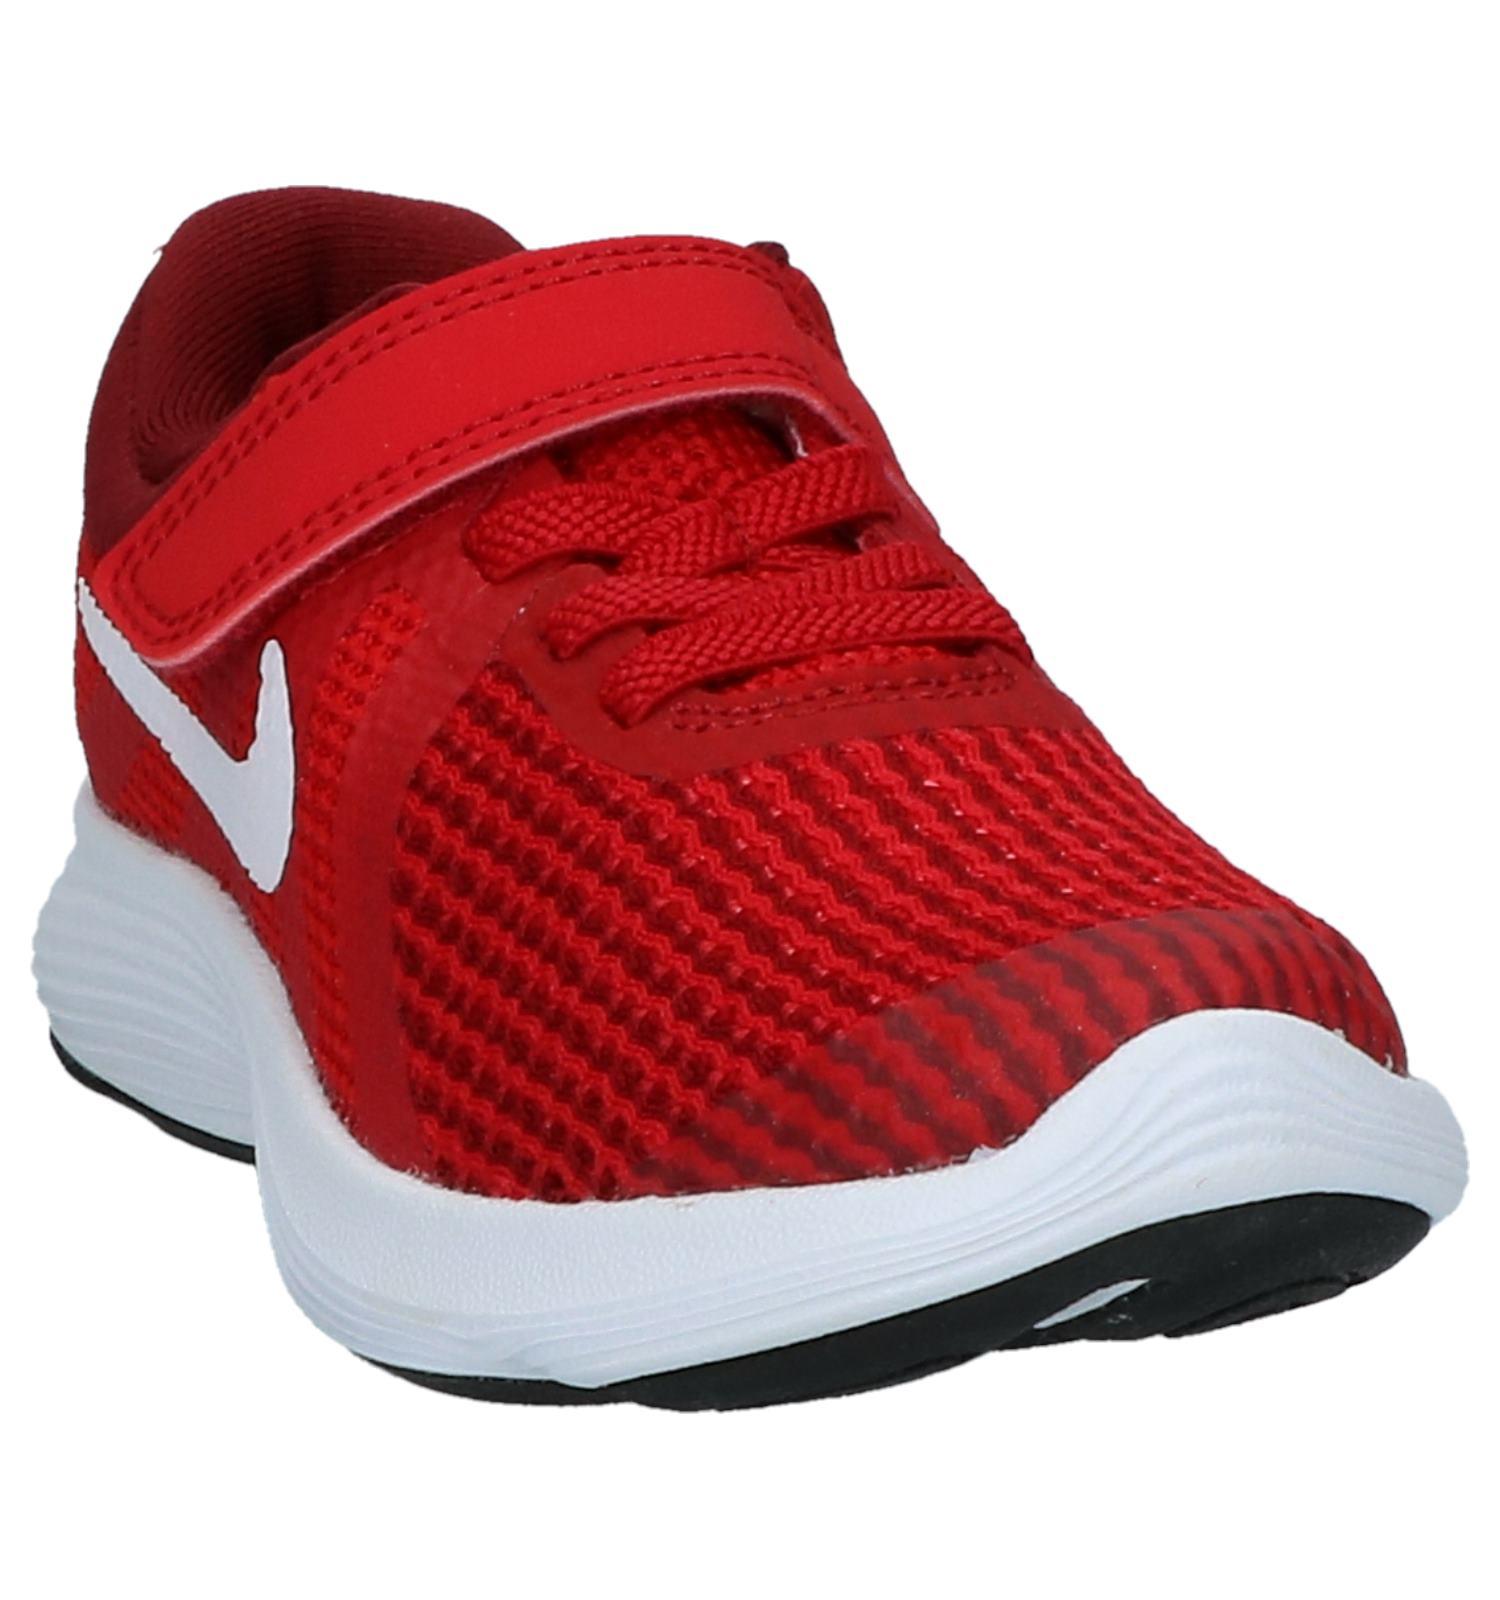 87e25f88586 Rode Sneakers Nike Revolution 4 | TORFS.BE | Gratis verzend en retour